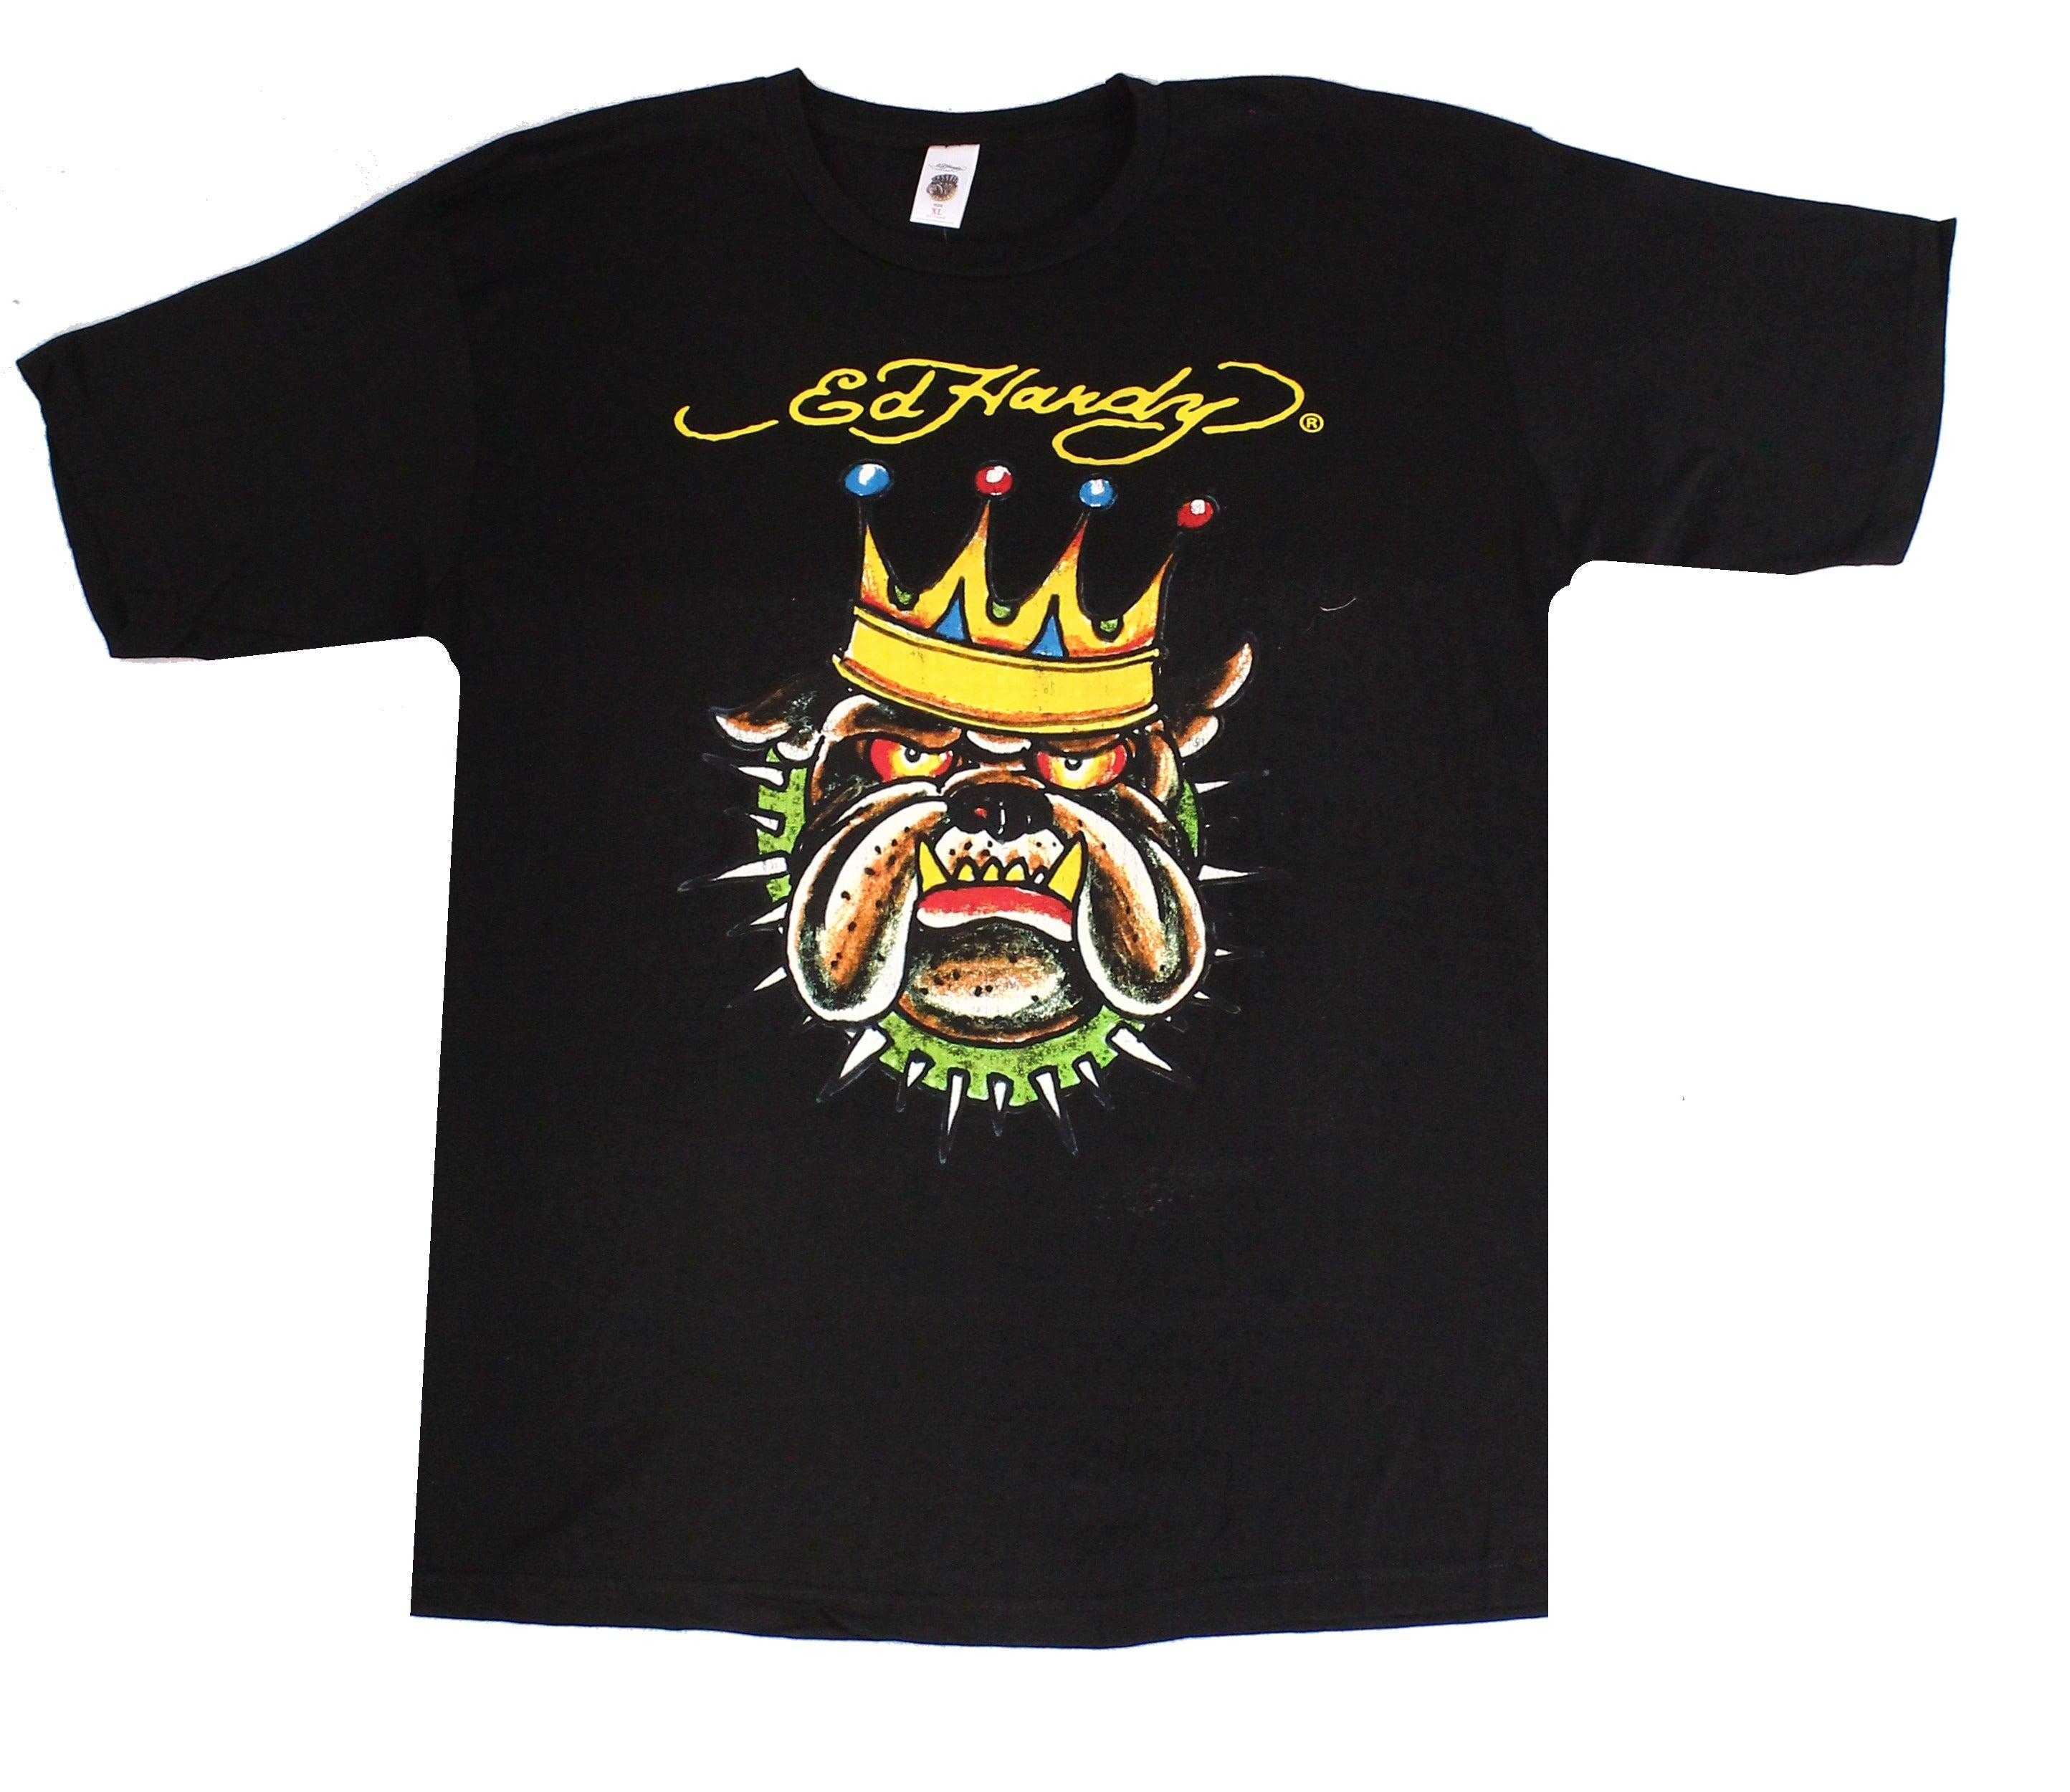 Ed Hardy Mens Shirt Black Size XL King Bulldog Crewneck Graphic Tee